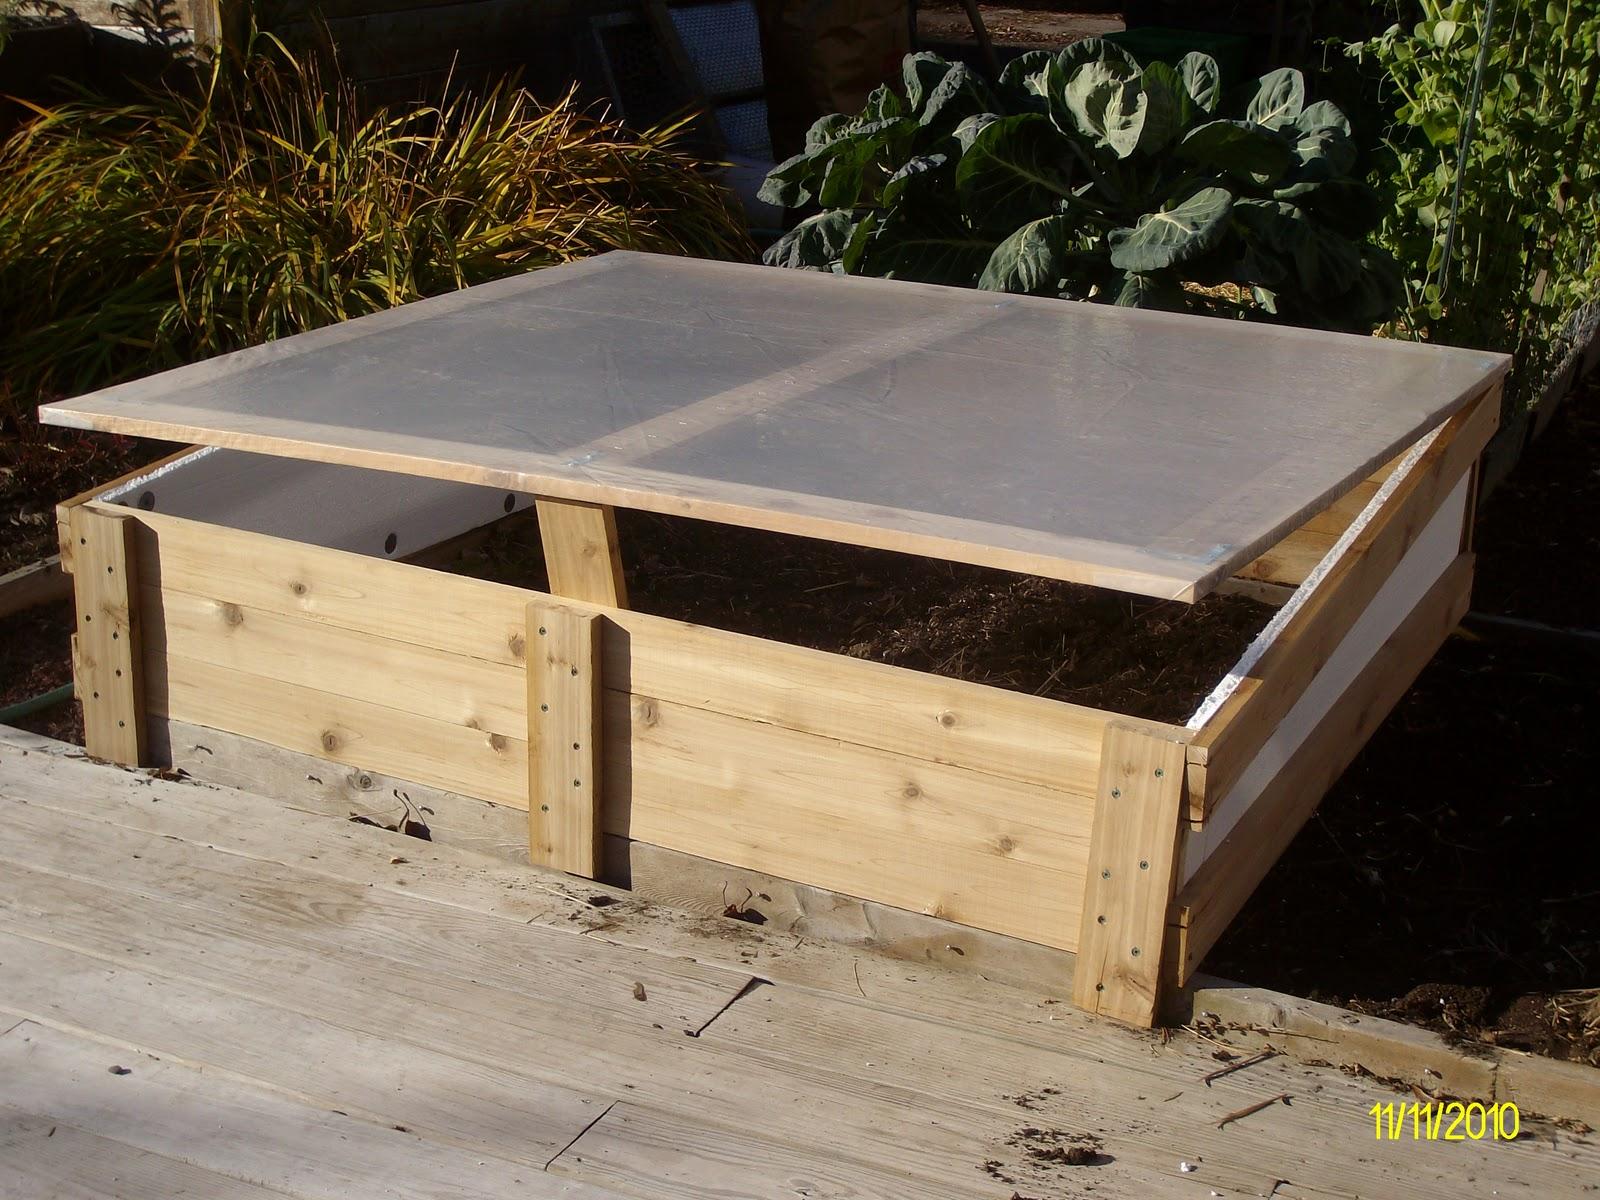 The Gardener of Eden: Building Cold Frames